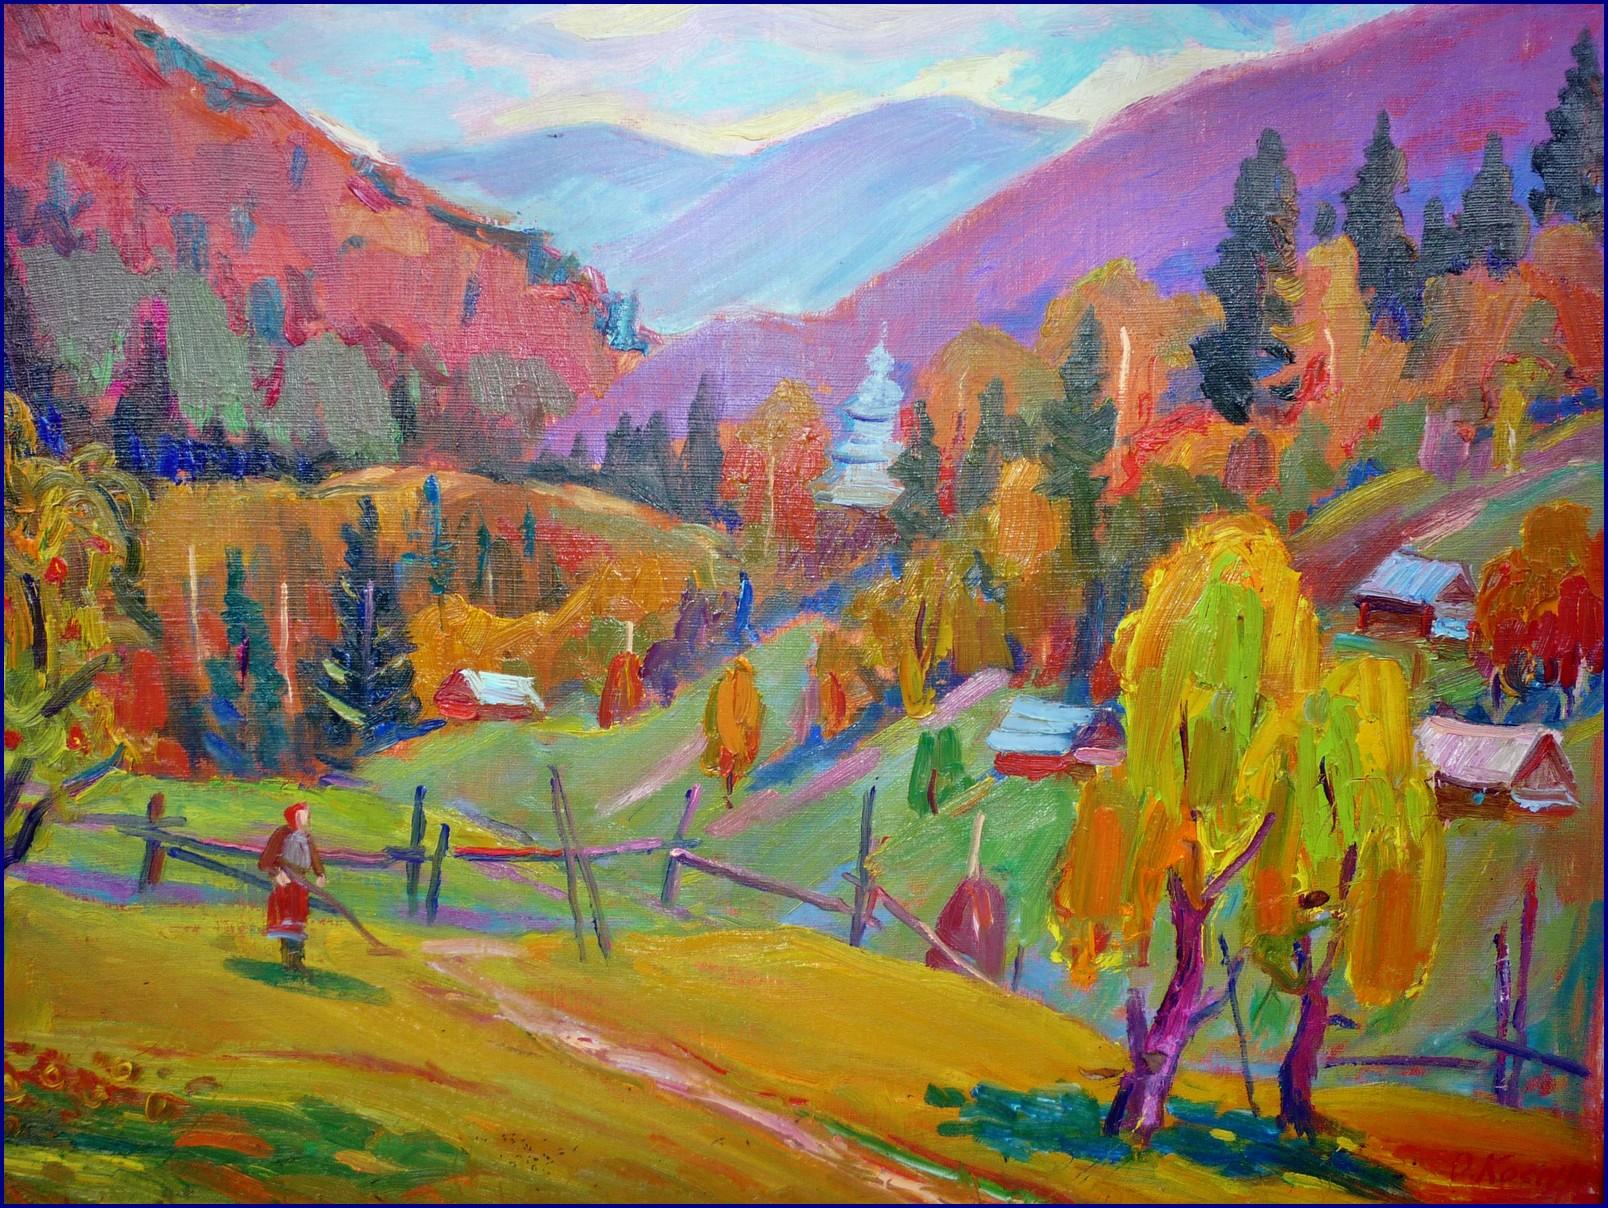 1310917273_grske-selo-voseni-1600x1200_www.nevsepic.com.ua